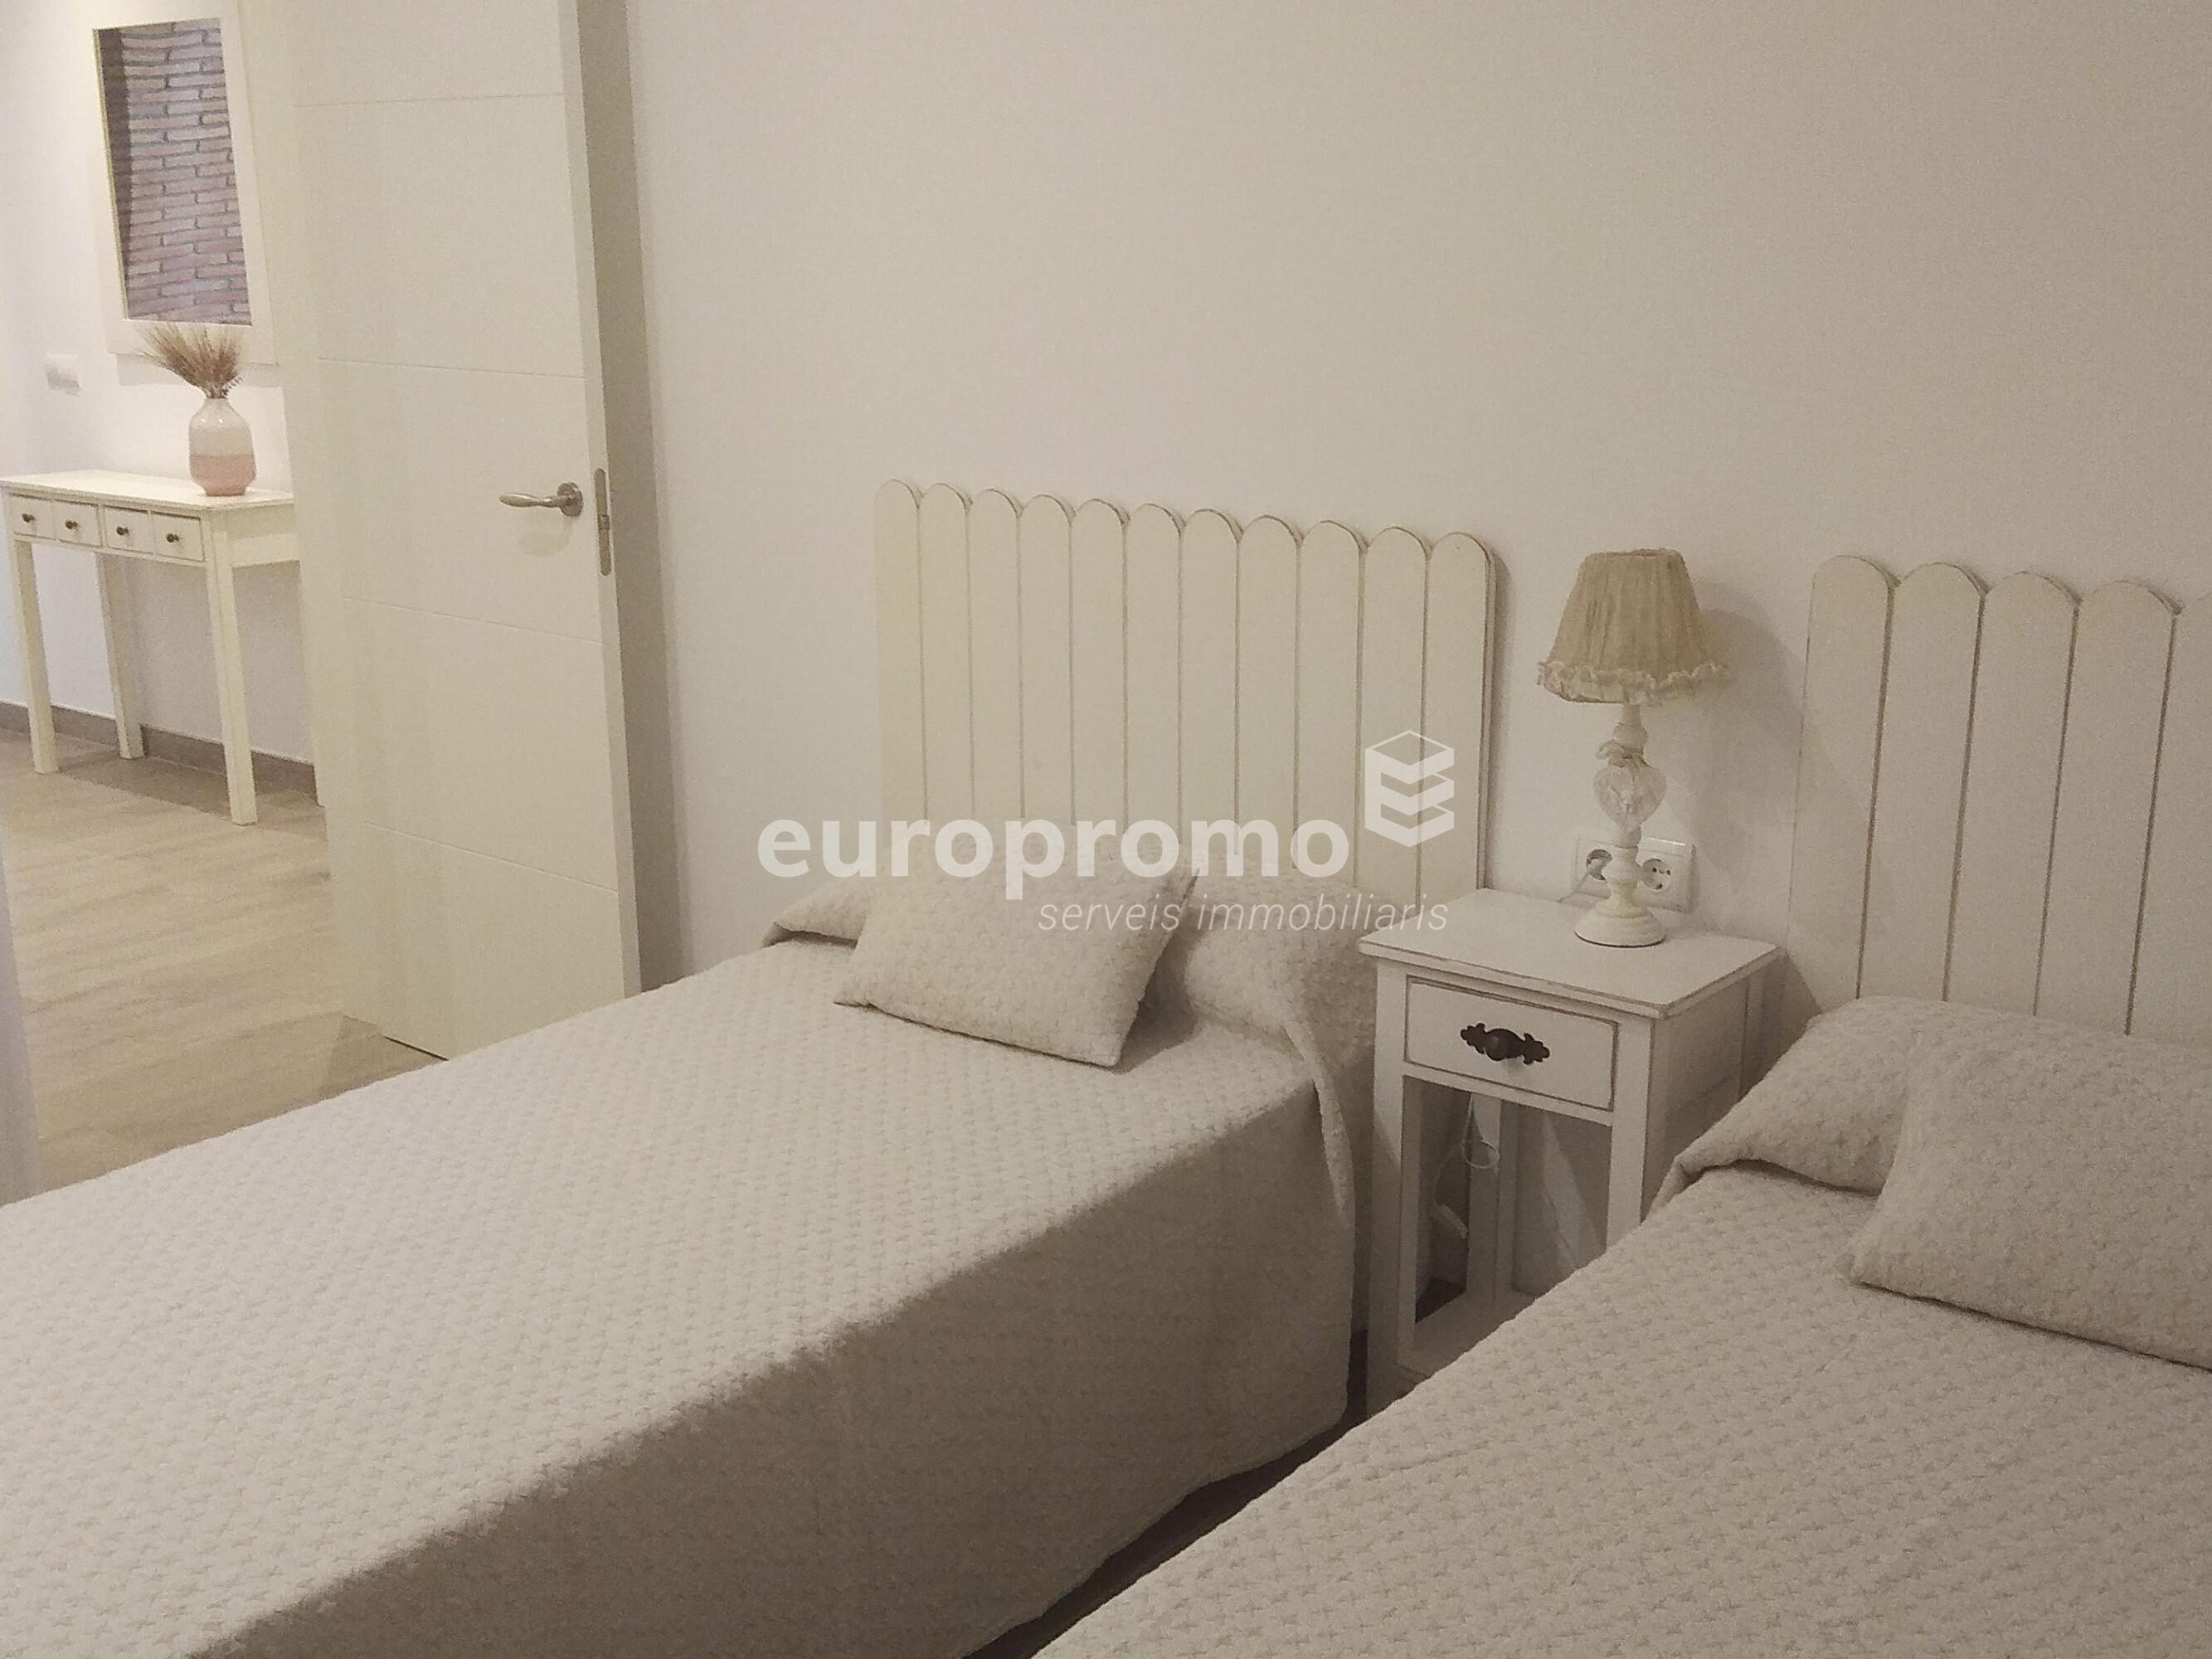 Espectacular casa d'alt standing al Golf Girona